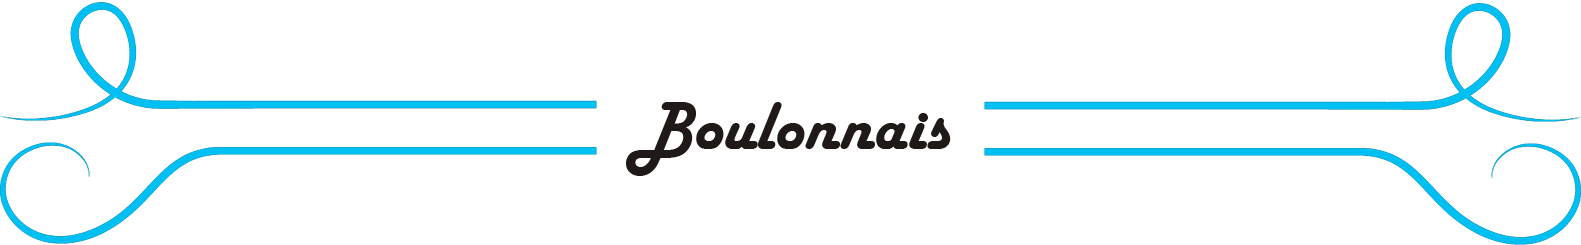 Boulonnais